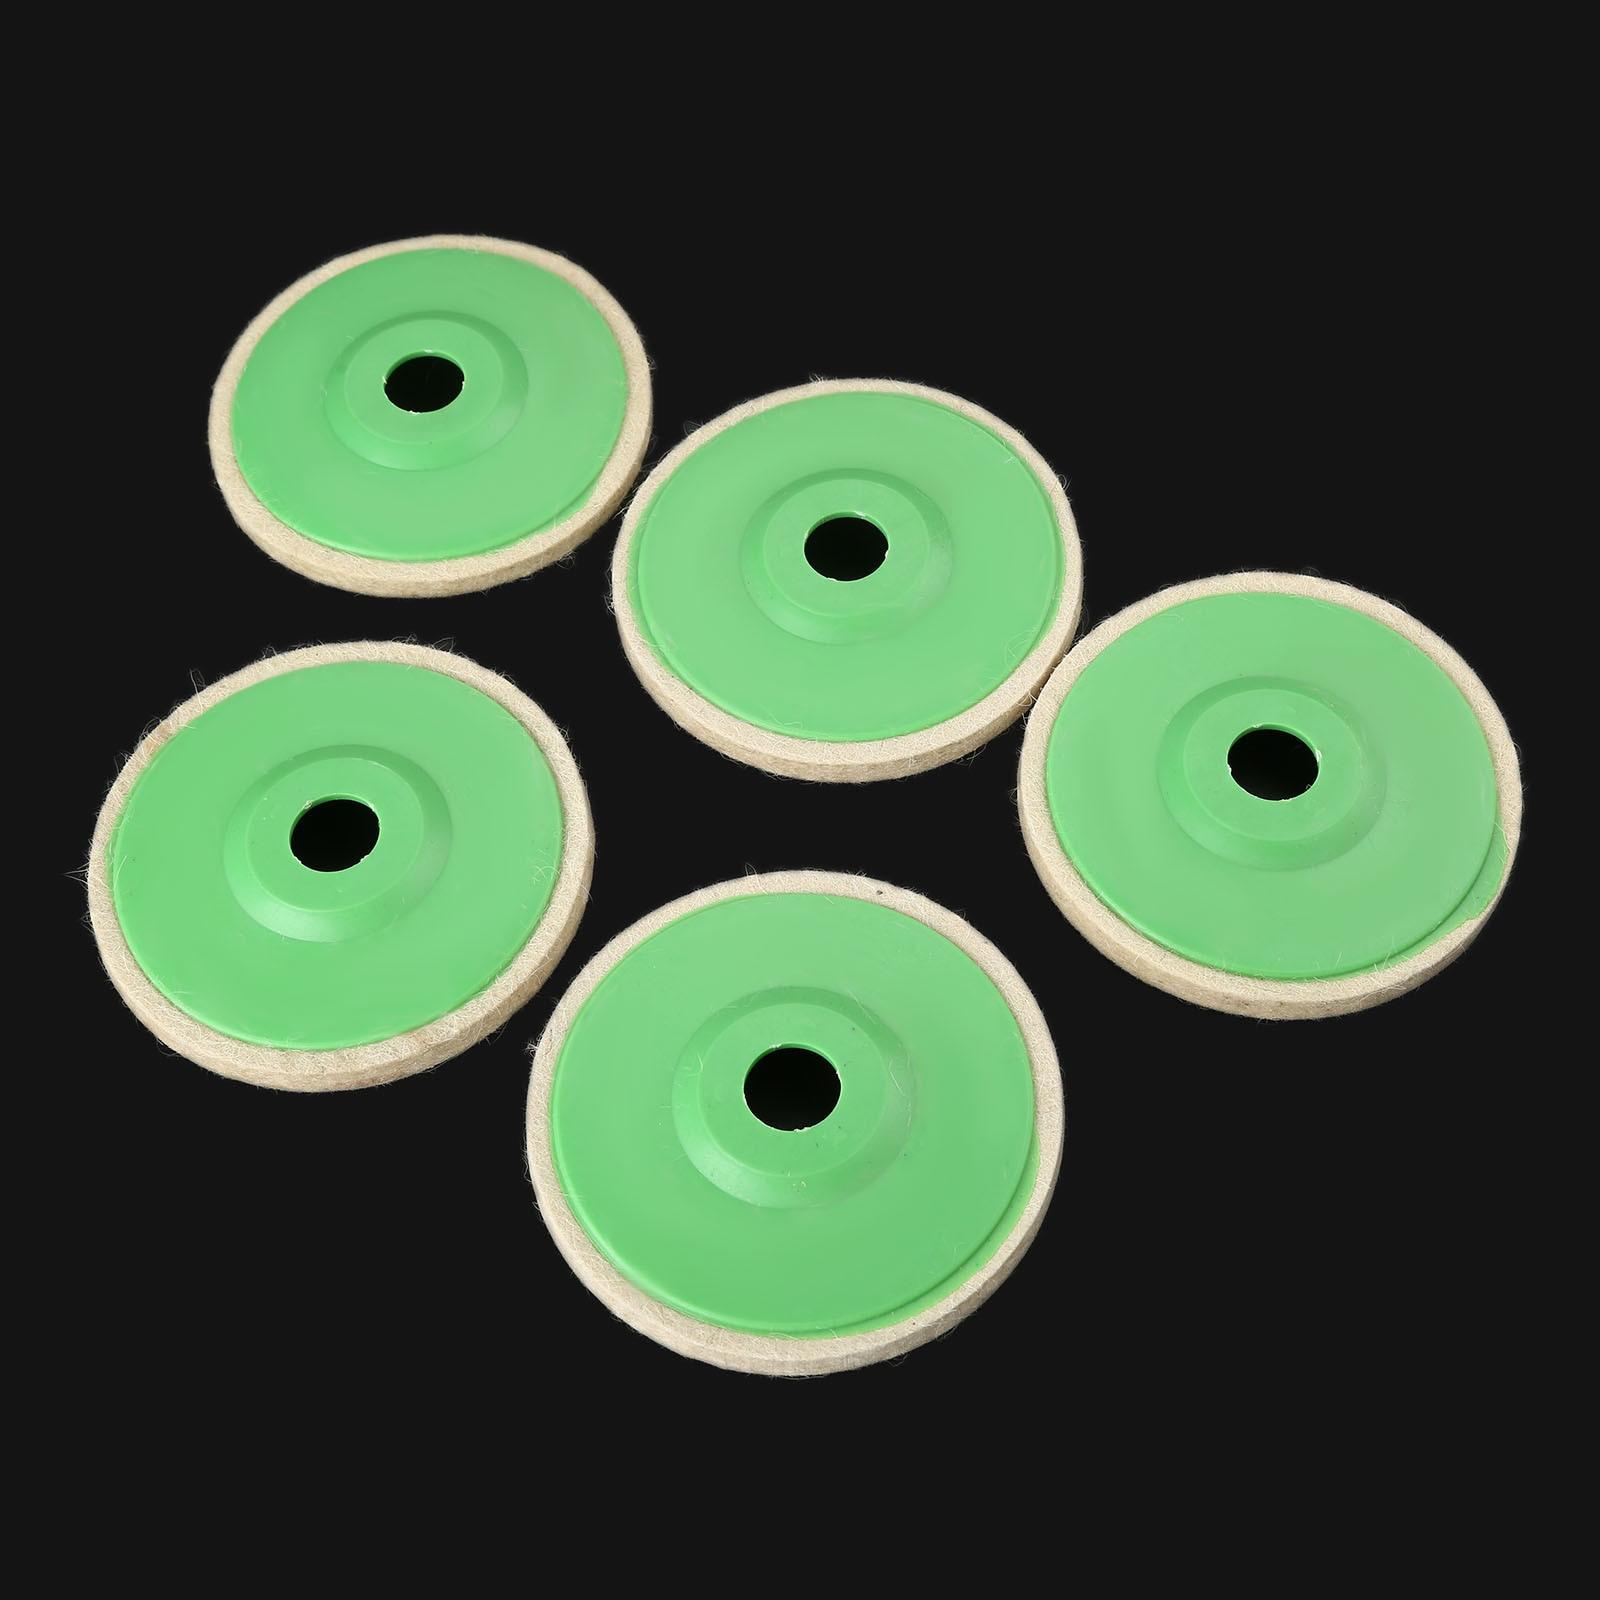 DRELD 5Pcs 5 Inch 125mm Polishing Wheel Wool Felt Buffing Angle Grinder Wheel Polishing Disc For Metal Marble Dremel Accessories